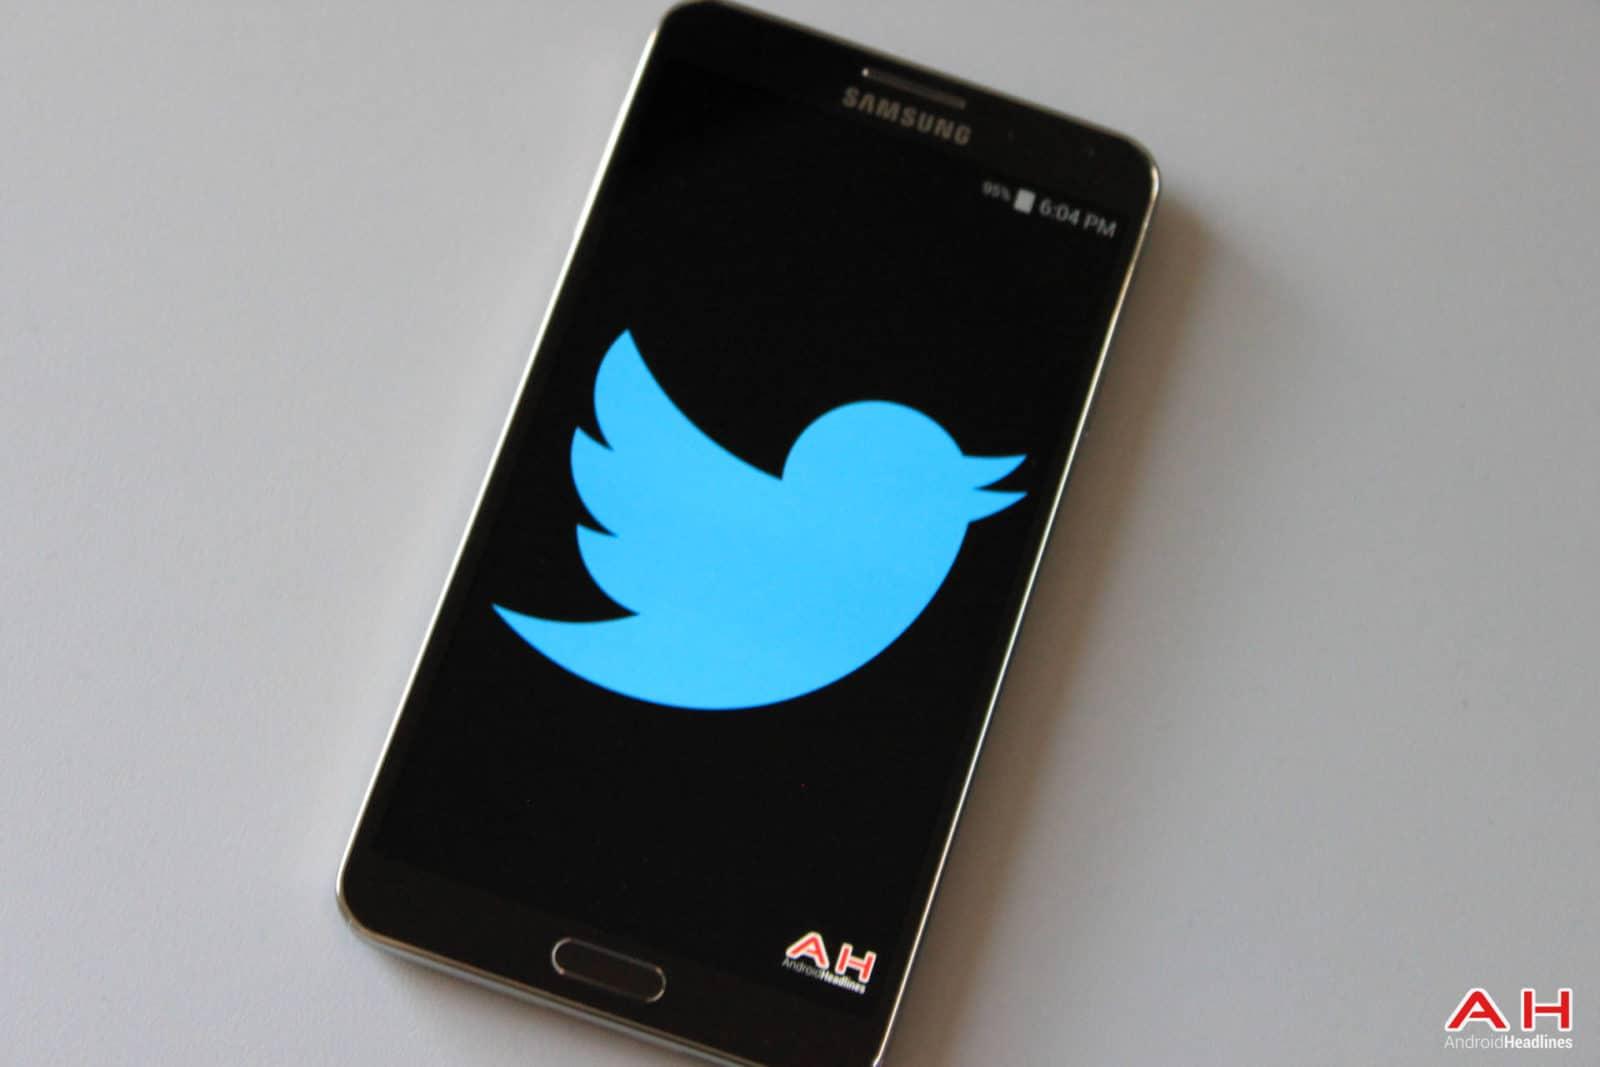 AH Twitter 1.0